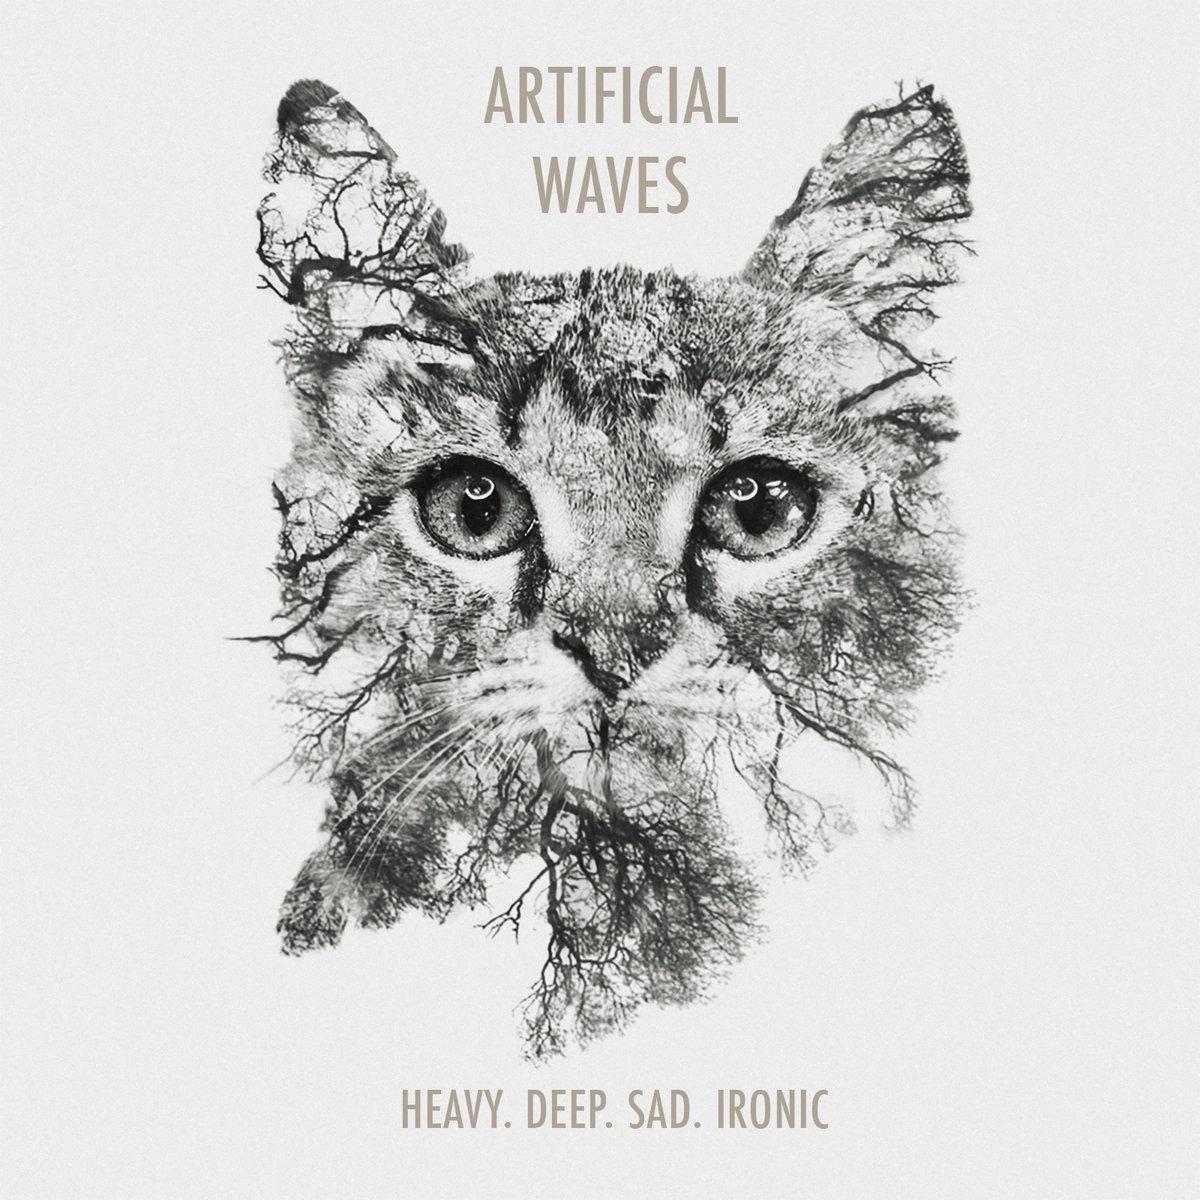 Heavy Deep Sad Ironic Artificial Waves